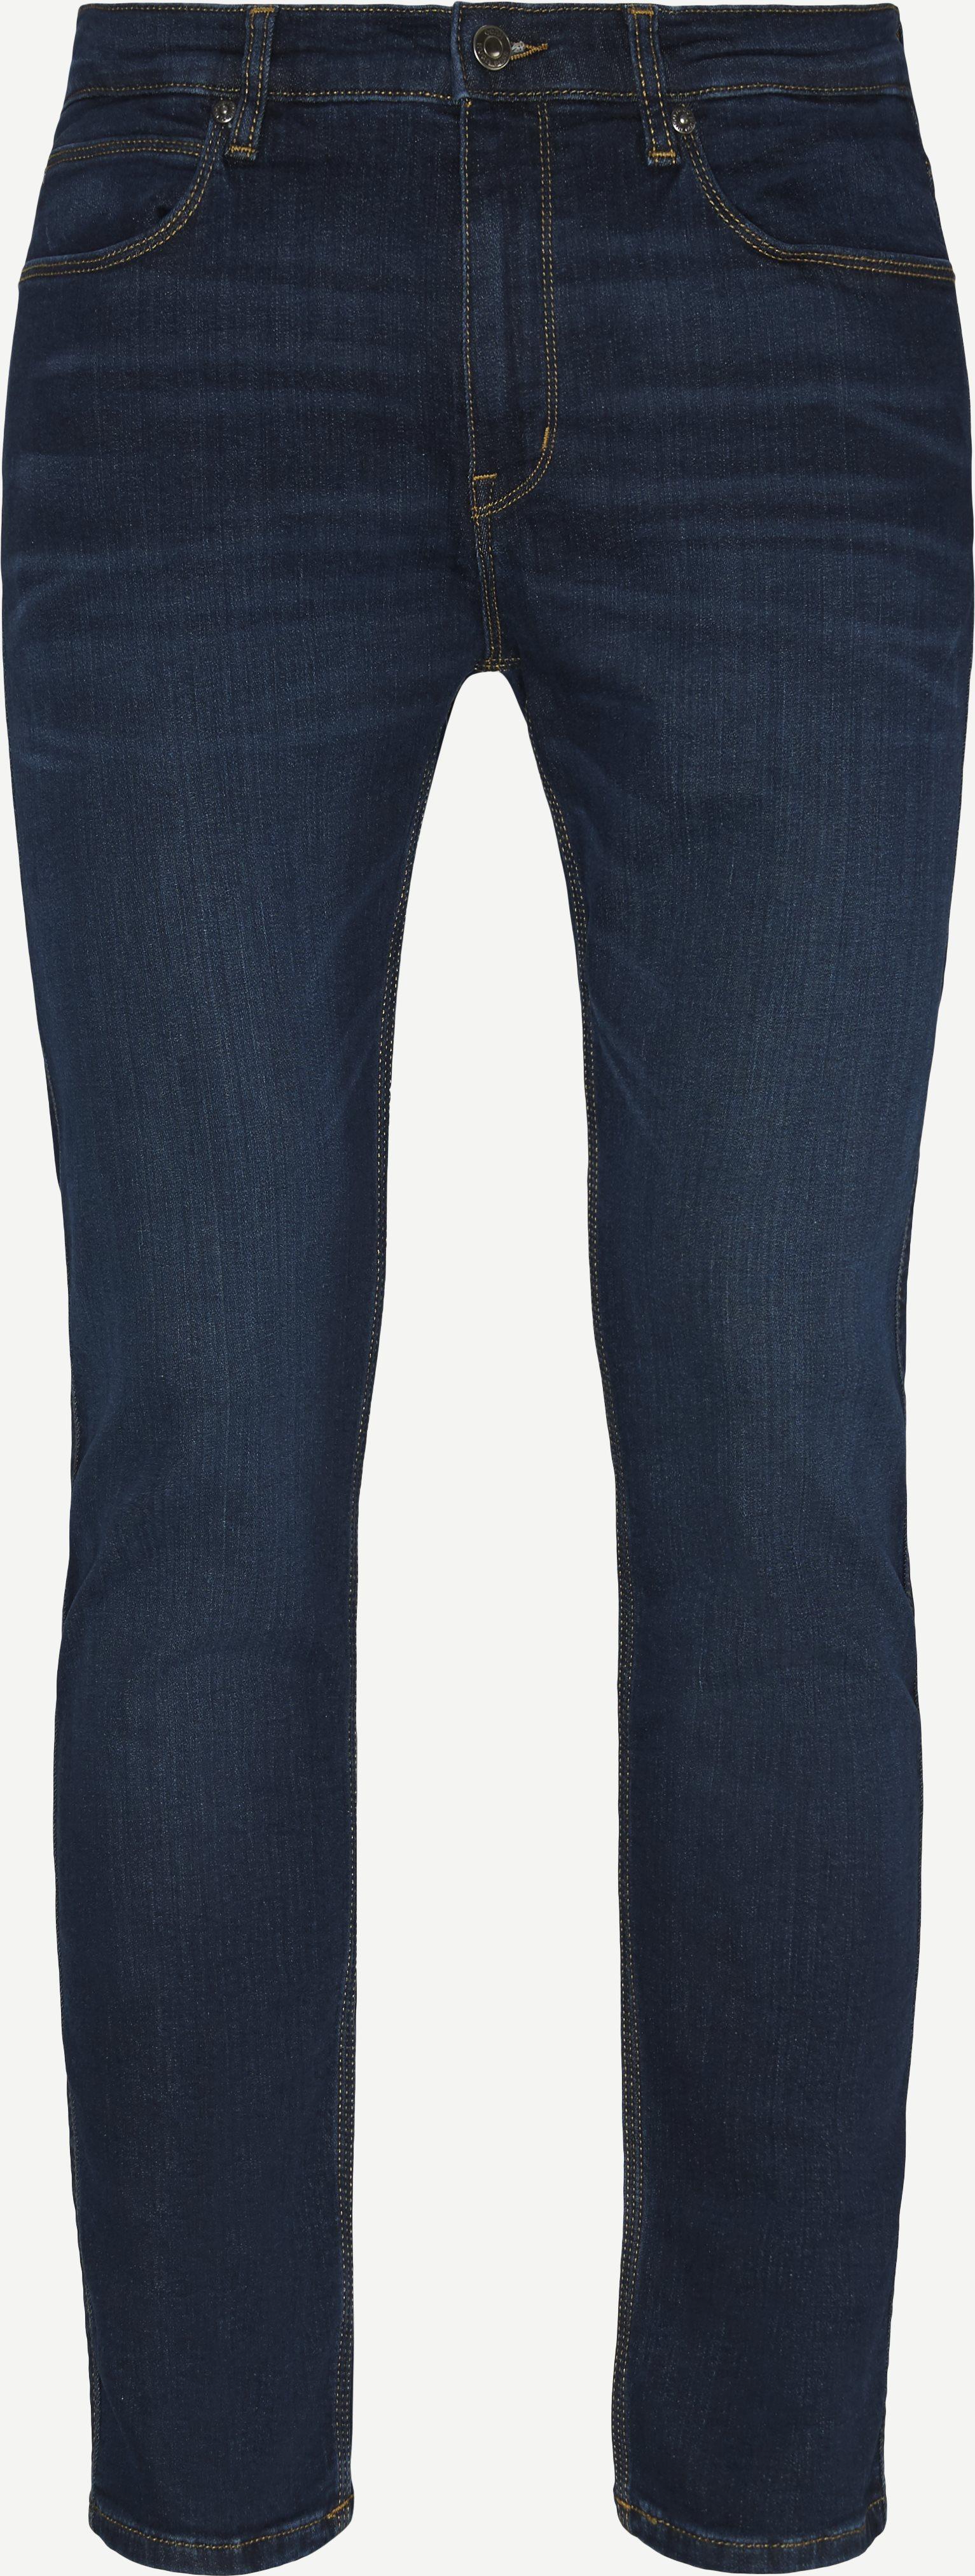 Jeans - Skinny fit - Jeans-Blau